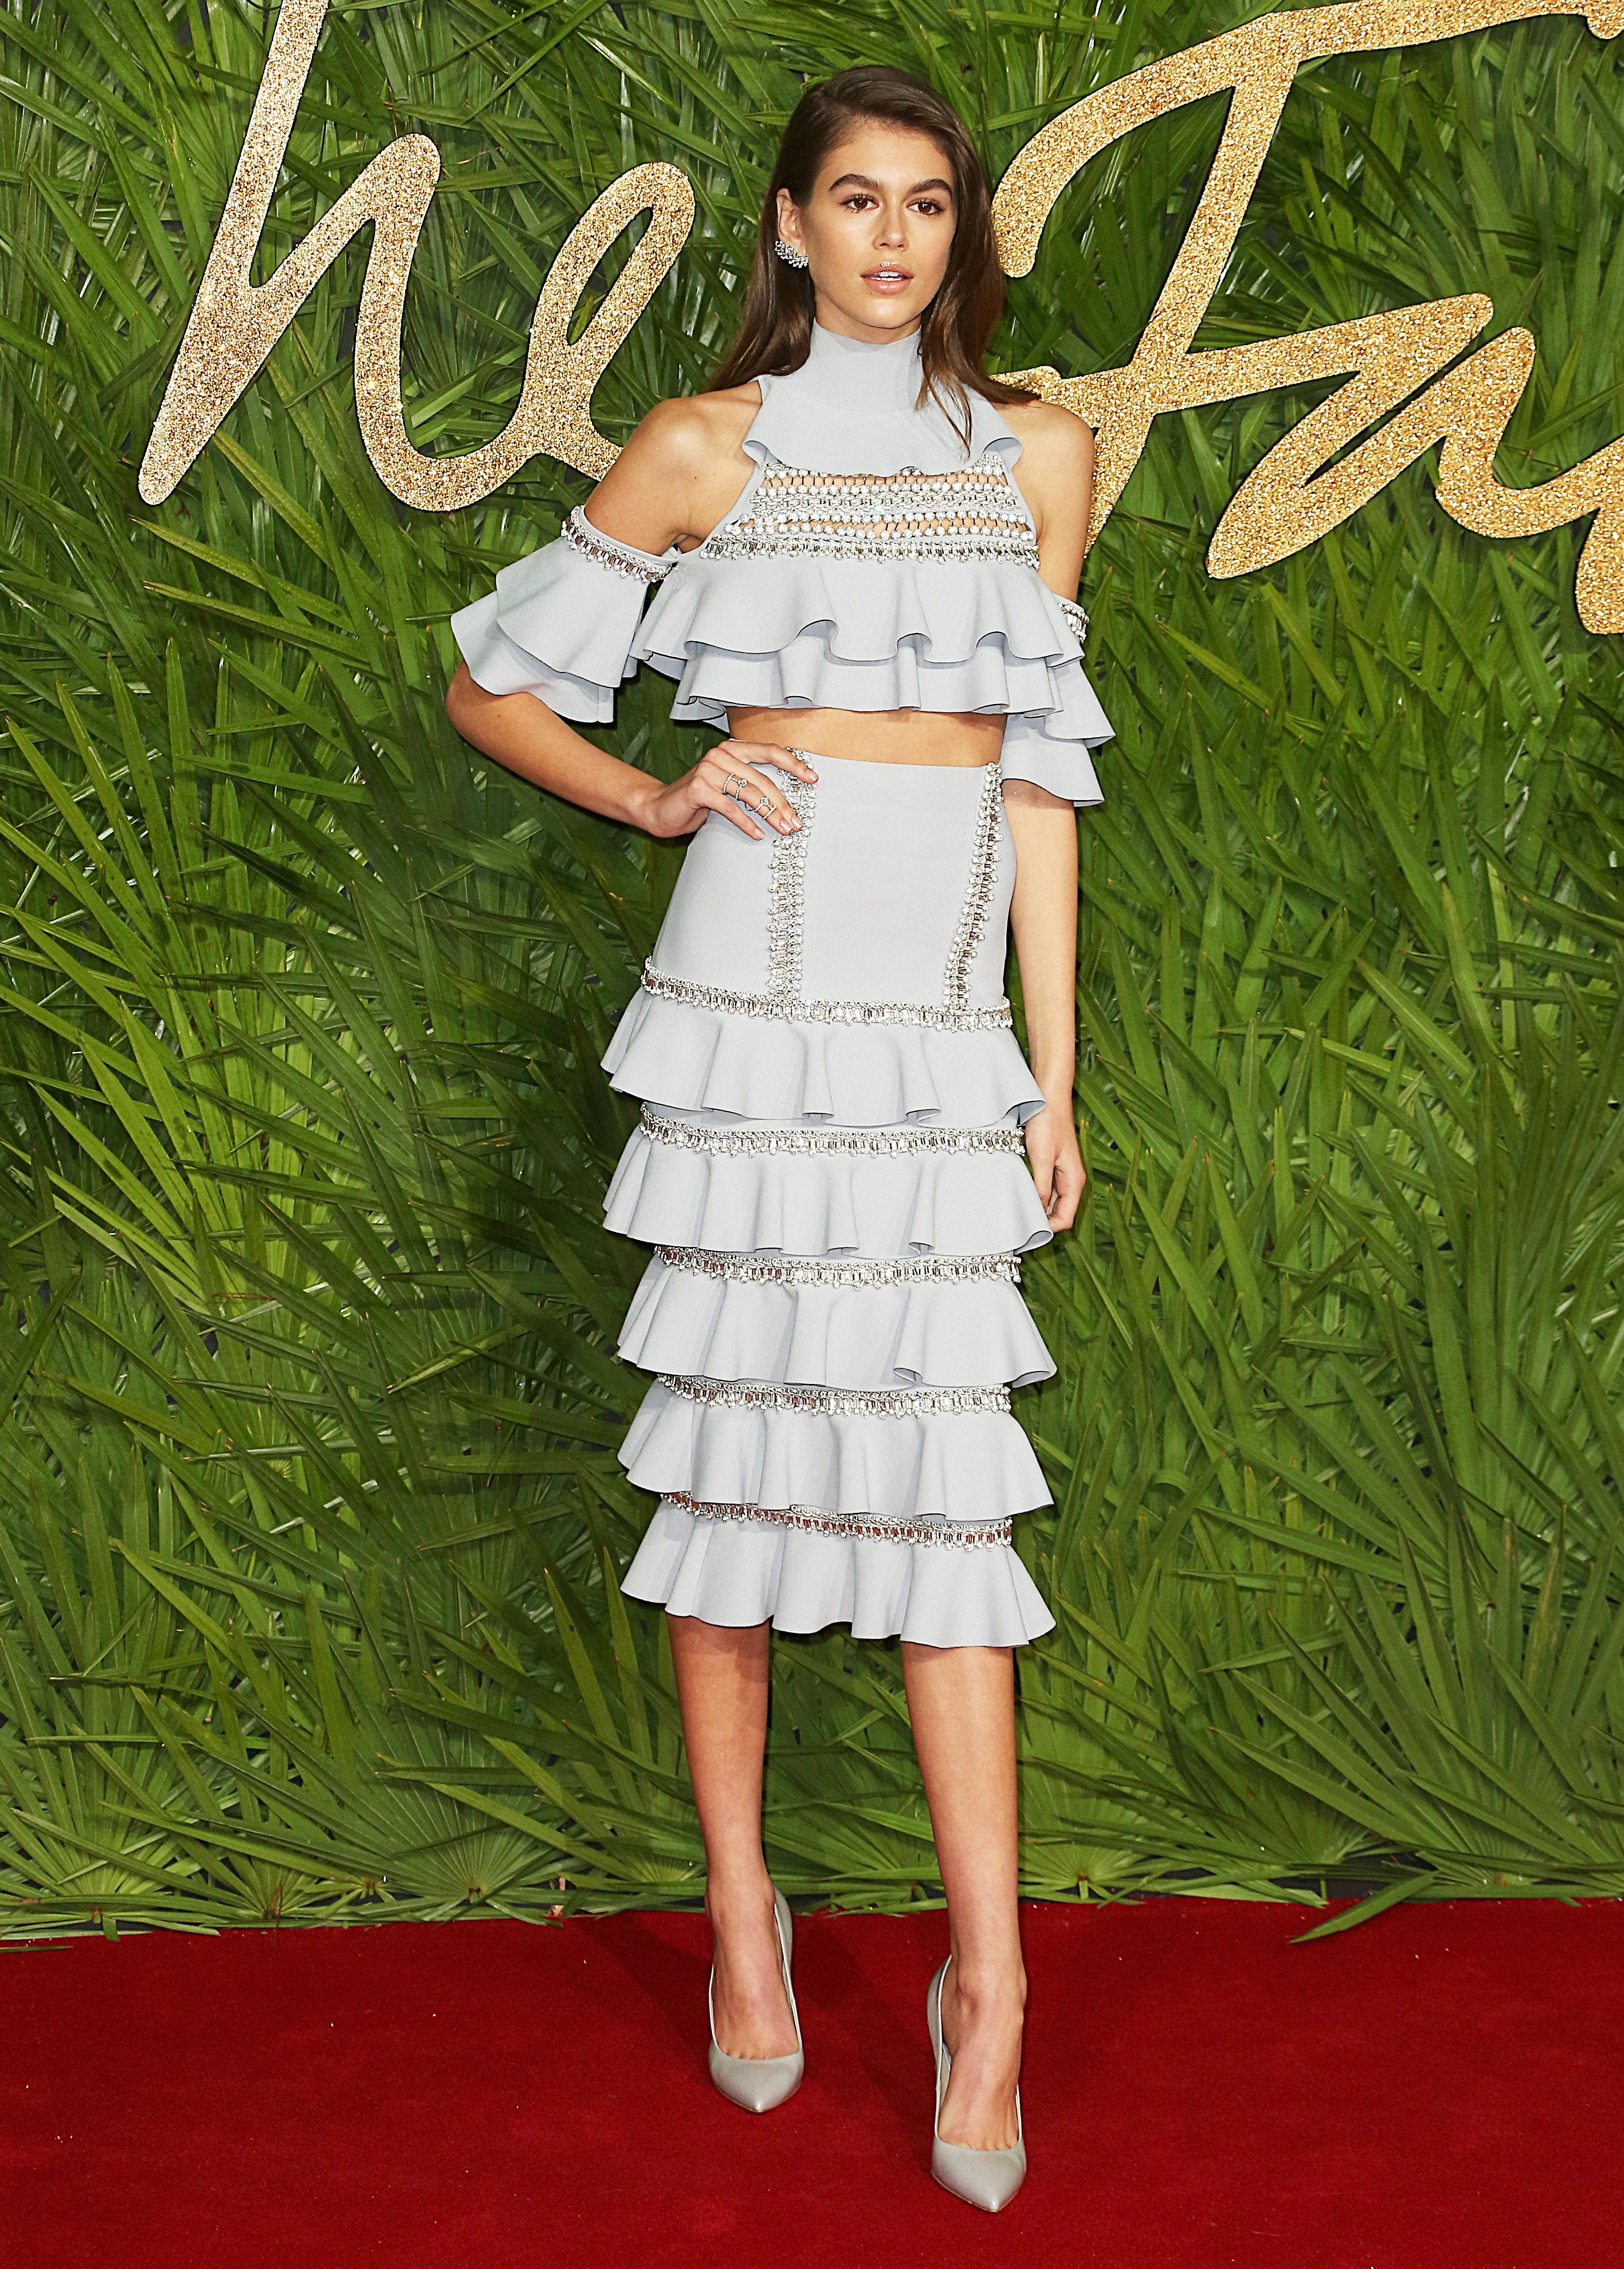 The Fashion Awards 2017, Royal Albert Hall, London UK, 04 December 2017, Photo by Brett D. Cove <P> Pictured: Kaia Jordan Gerber <B>Ref: SPL1633061  051217  </B><BR/> Picture by: Brett D. Cove / Splash News<BR/> </P><P> <B>Splash News and Pictures</B><BR/> Los Angeles:310-821-2666<BR/> New York:212-619-2666<BR/> London:870-934-2666<BR/> <span id=